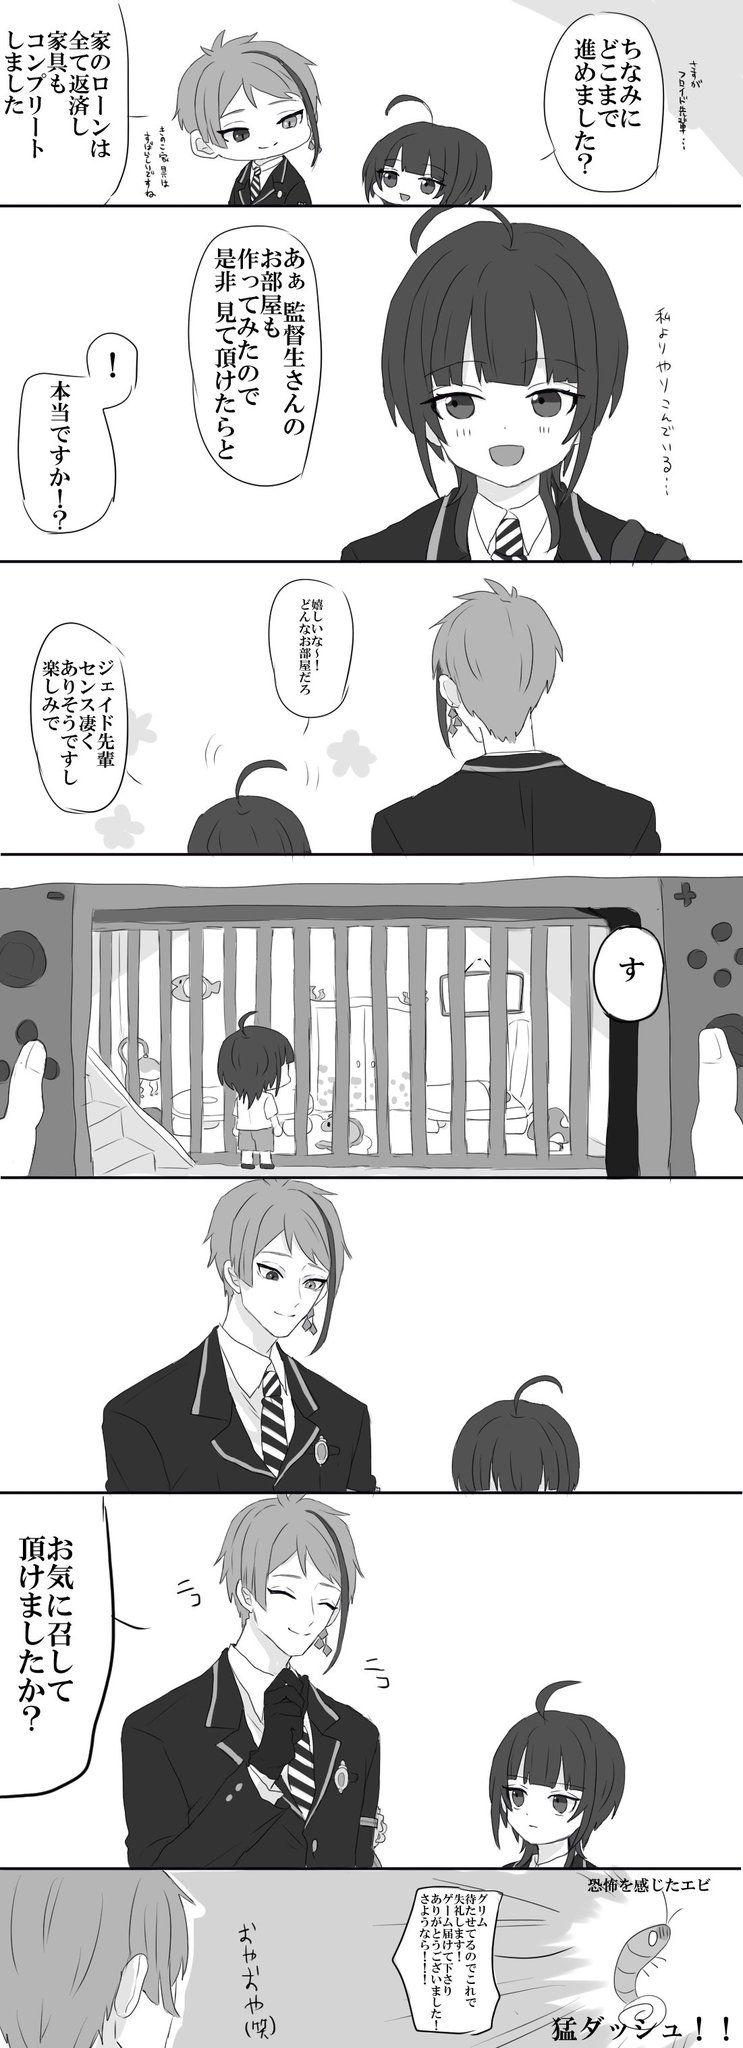 twitter アニメ イラスト 漫画